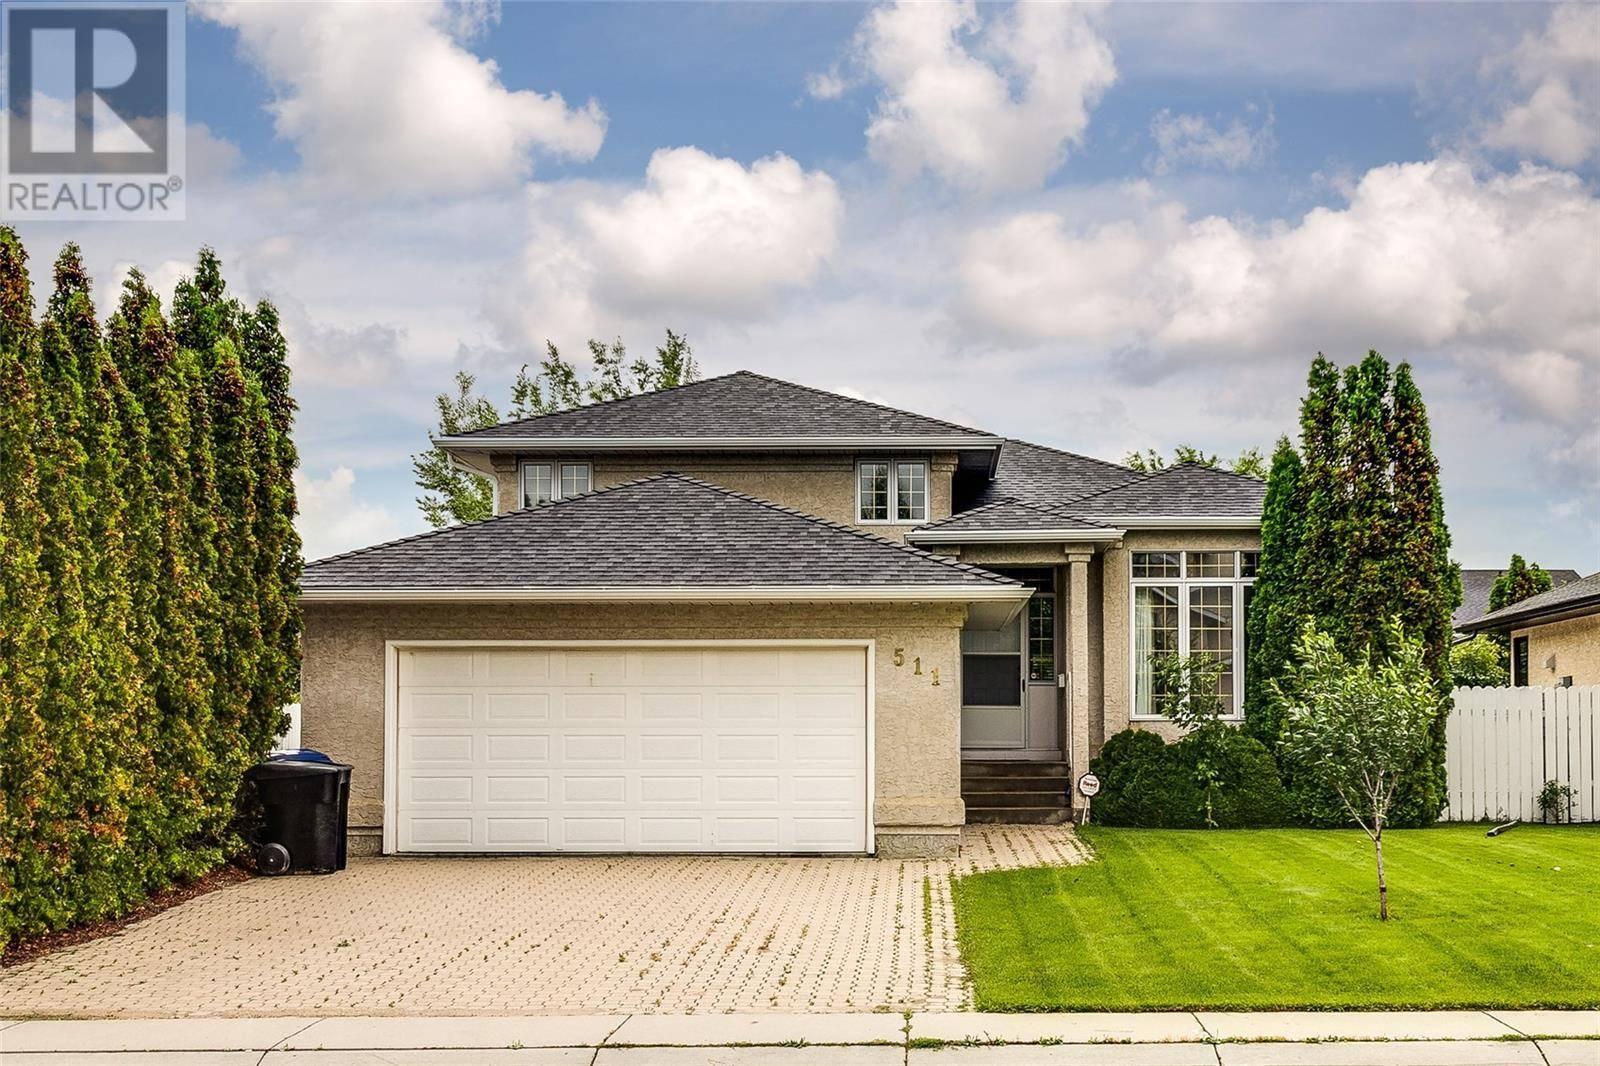 House for sale at 511 Blackthorn Cres Saskatoon Saskatchewan - MLS: SK781607